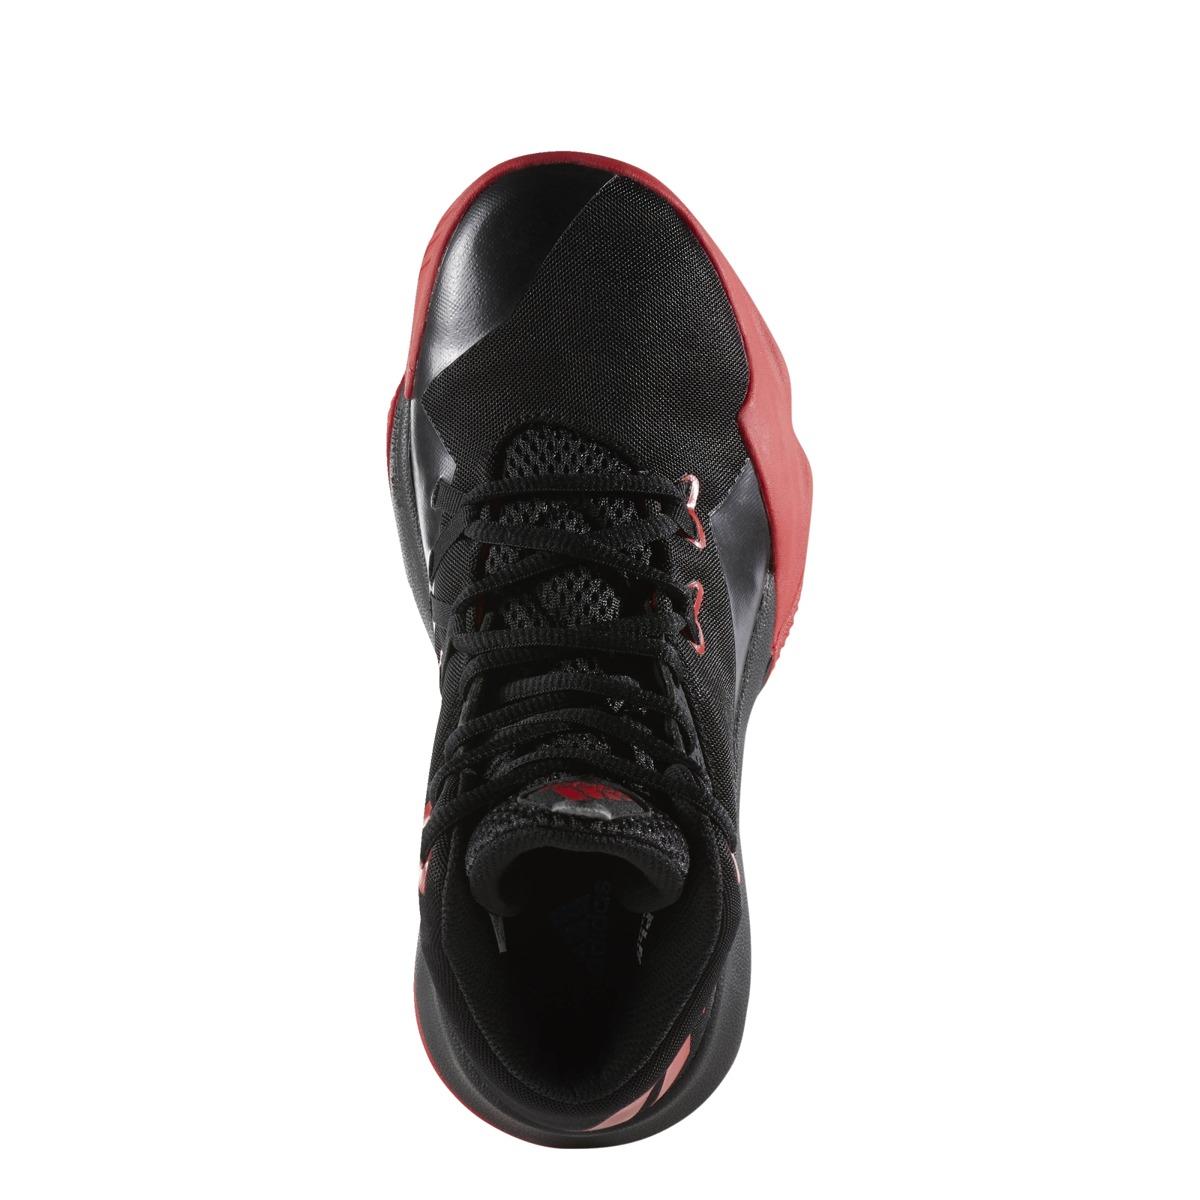 pretty nice 197af 563fe Buty do koszykówki Adidas Dual Threat - CG4218 (7218371507)